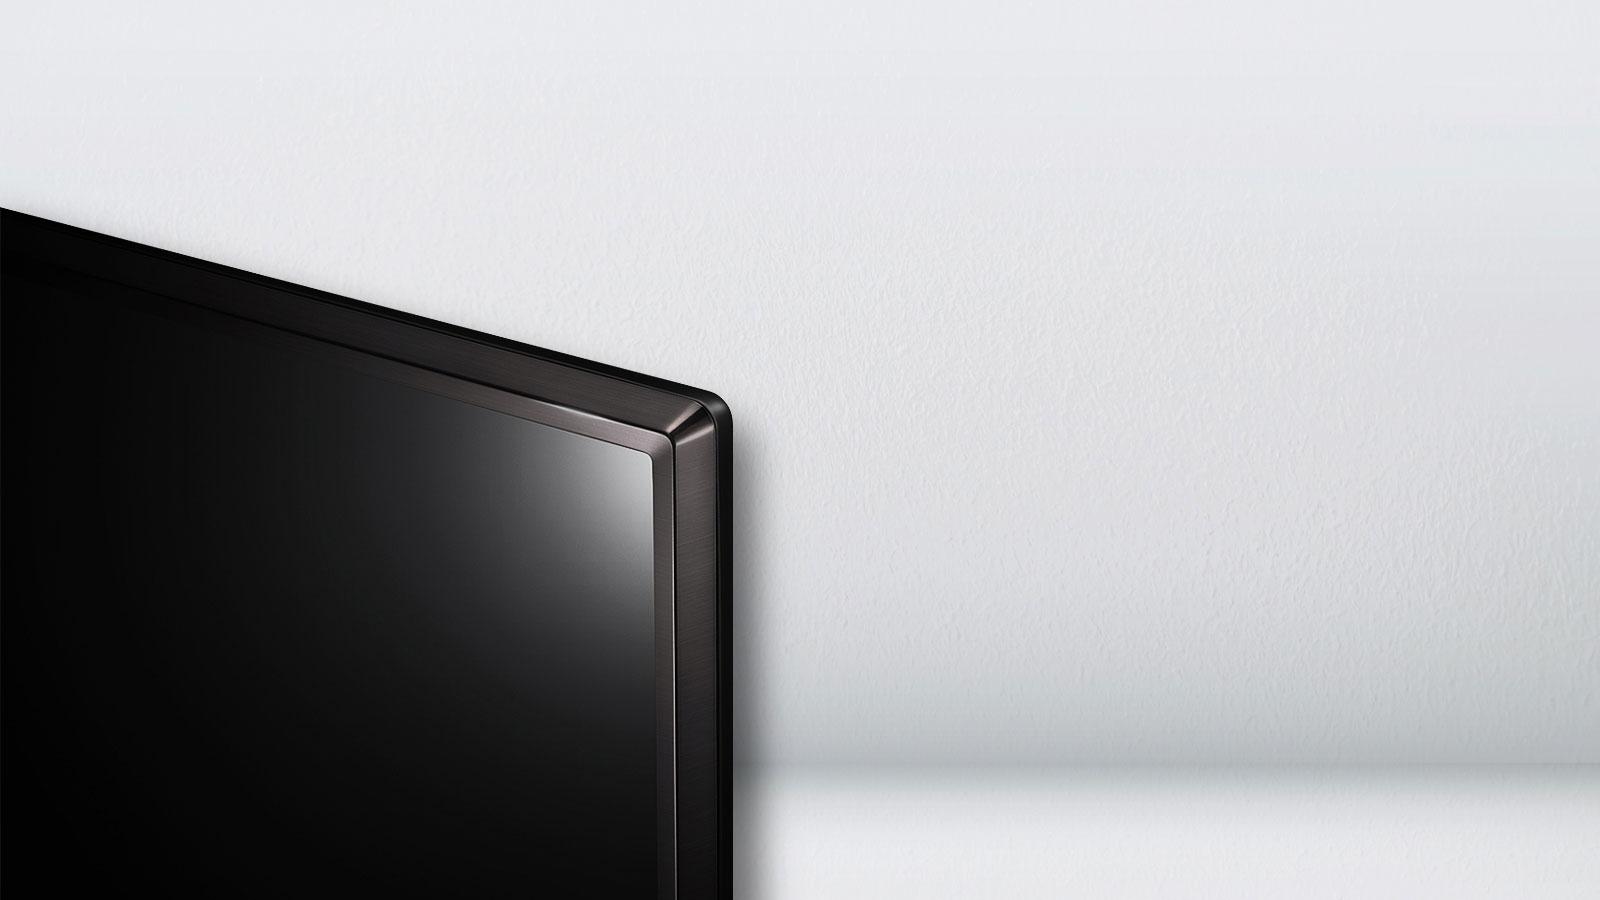 43 Full HD SMART TV